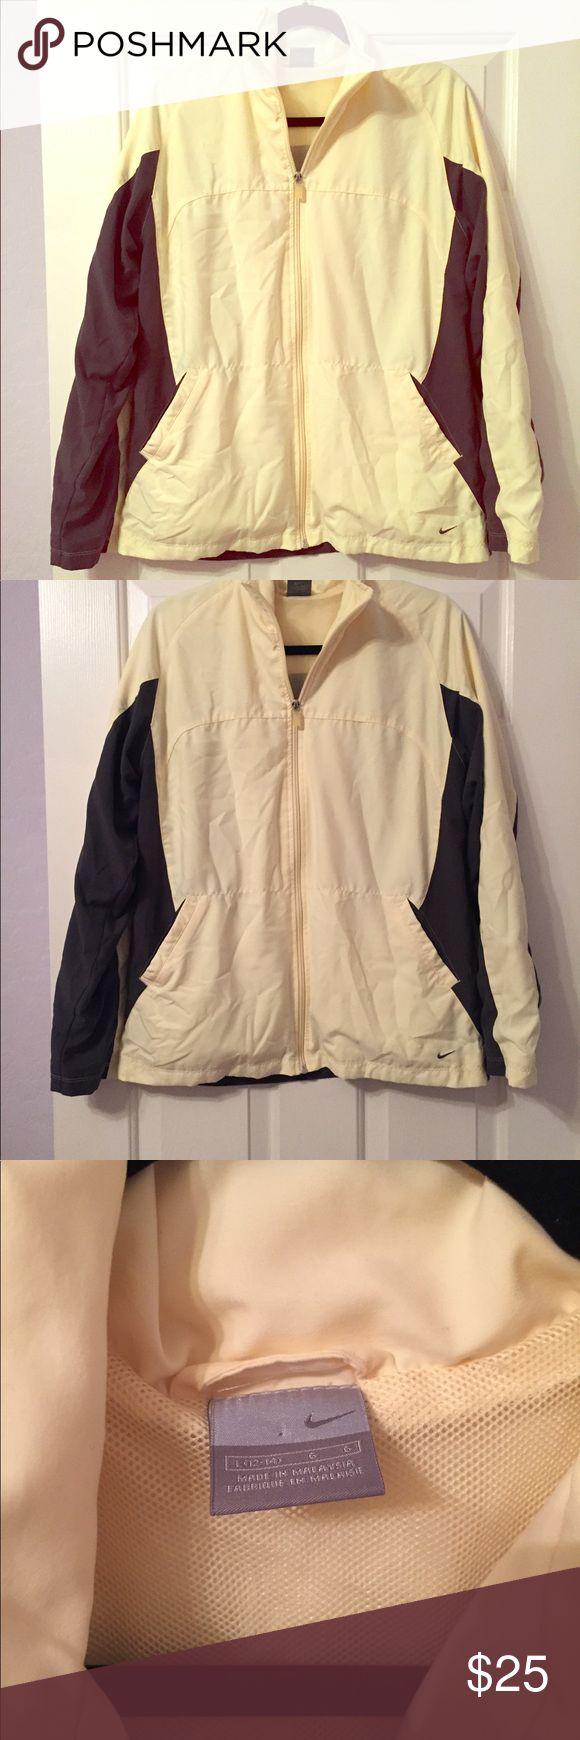 💕 NIKE 💕 Yellow & Gray Women's Nike Jacket Size L Yellow and Gray Nike Nike Jackets & Coats